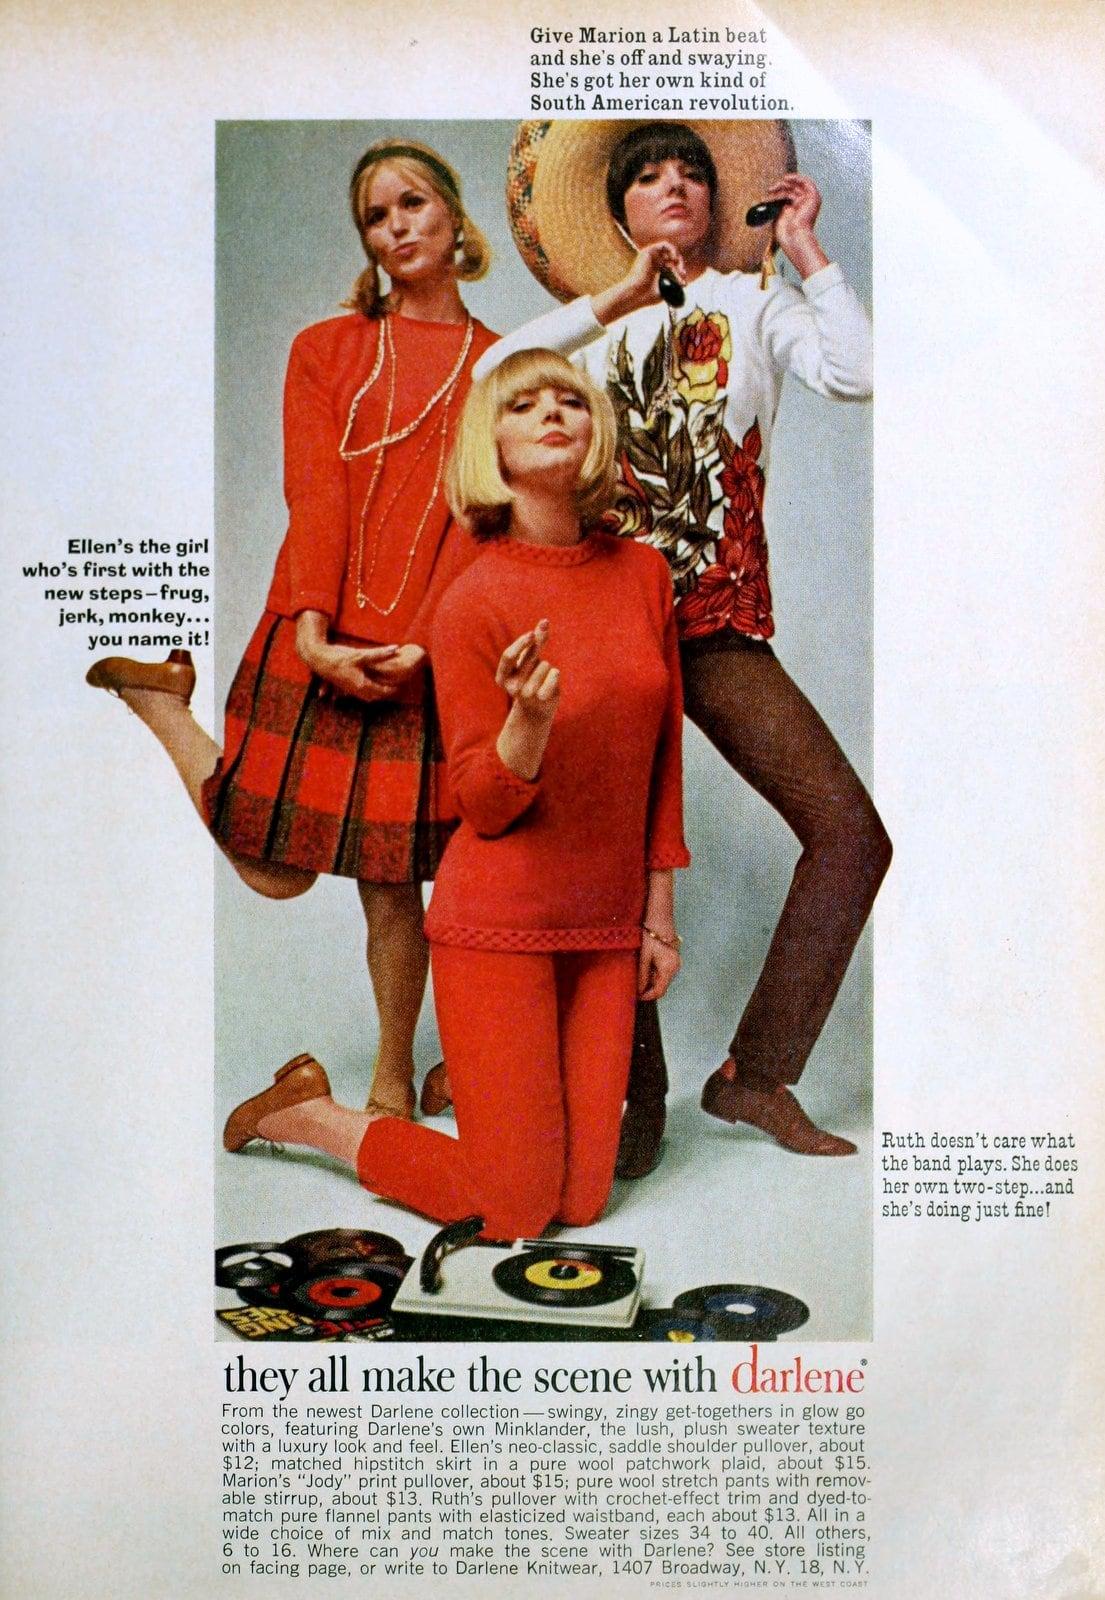 Darlene Collection sweaters and womenswear (1965)